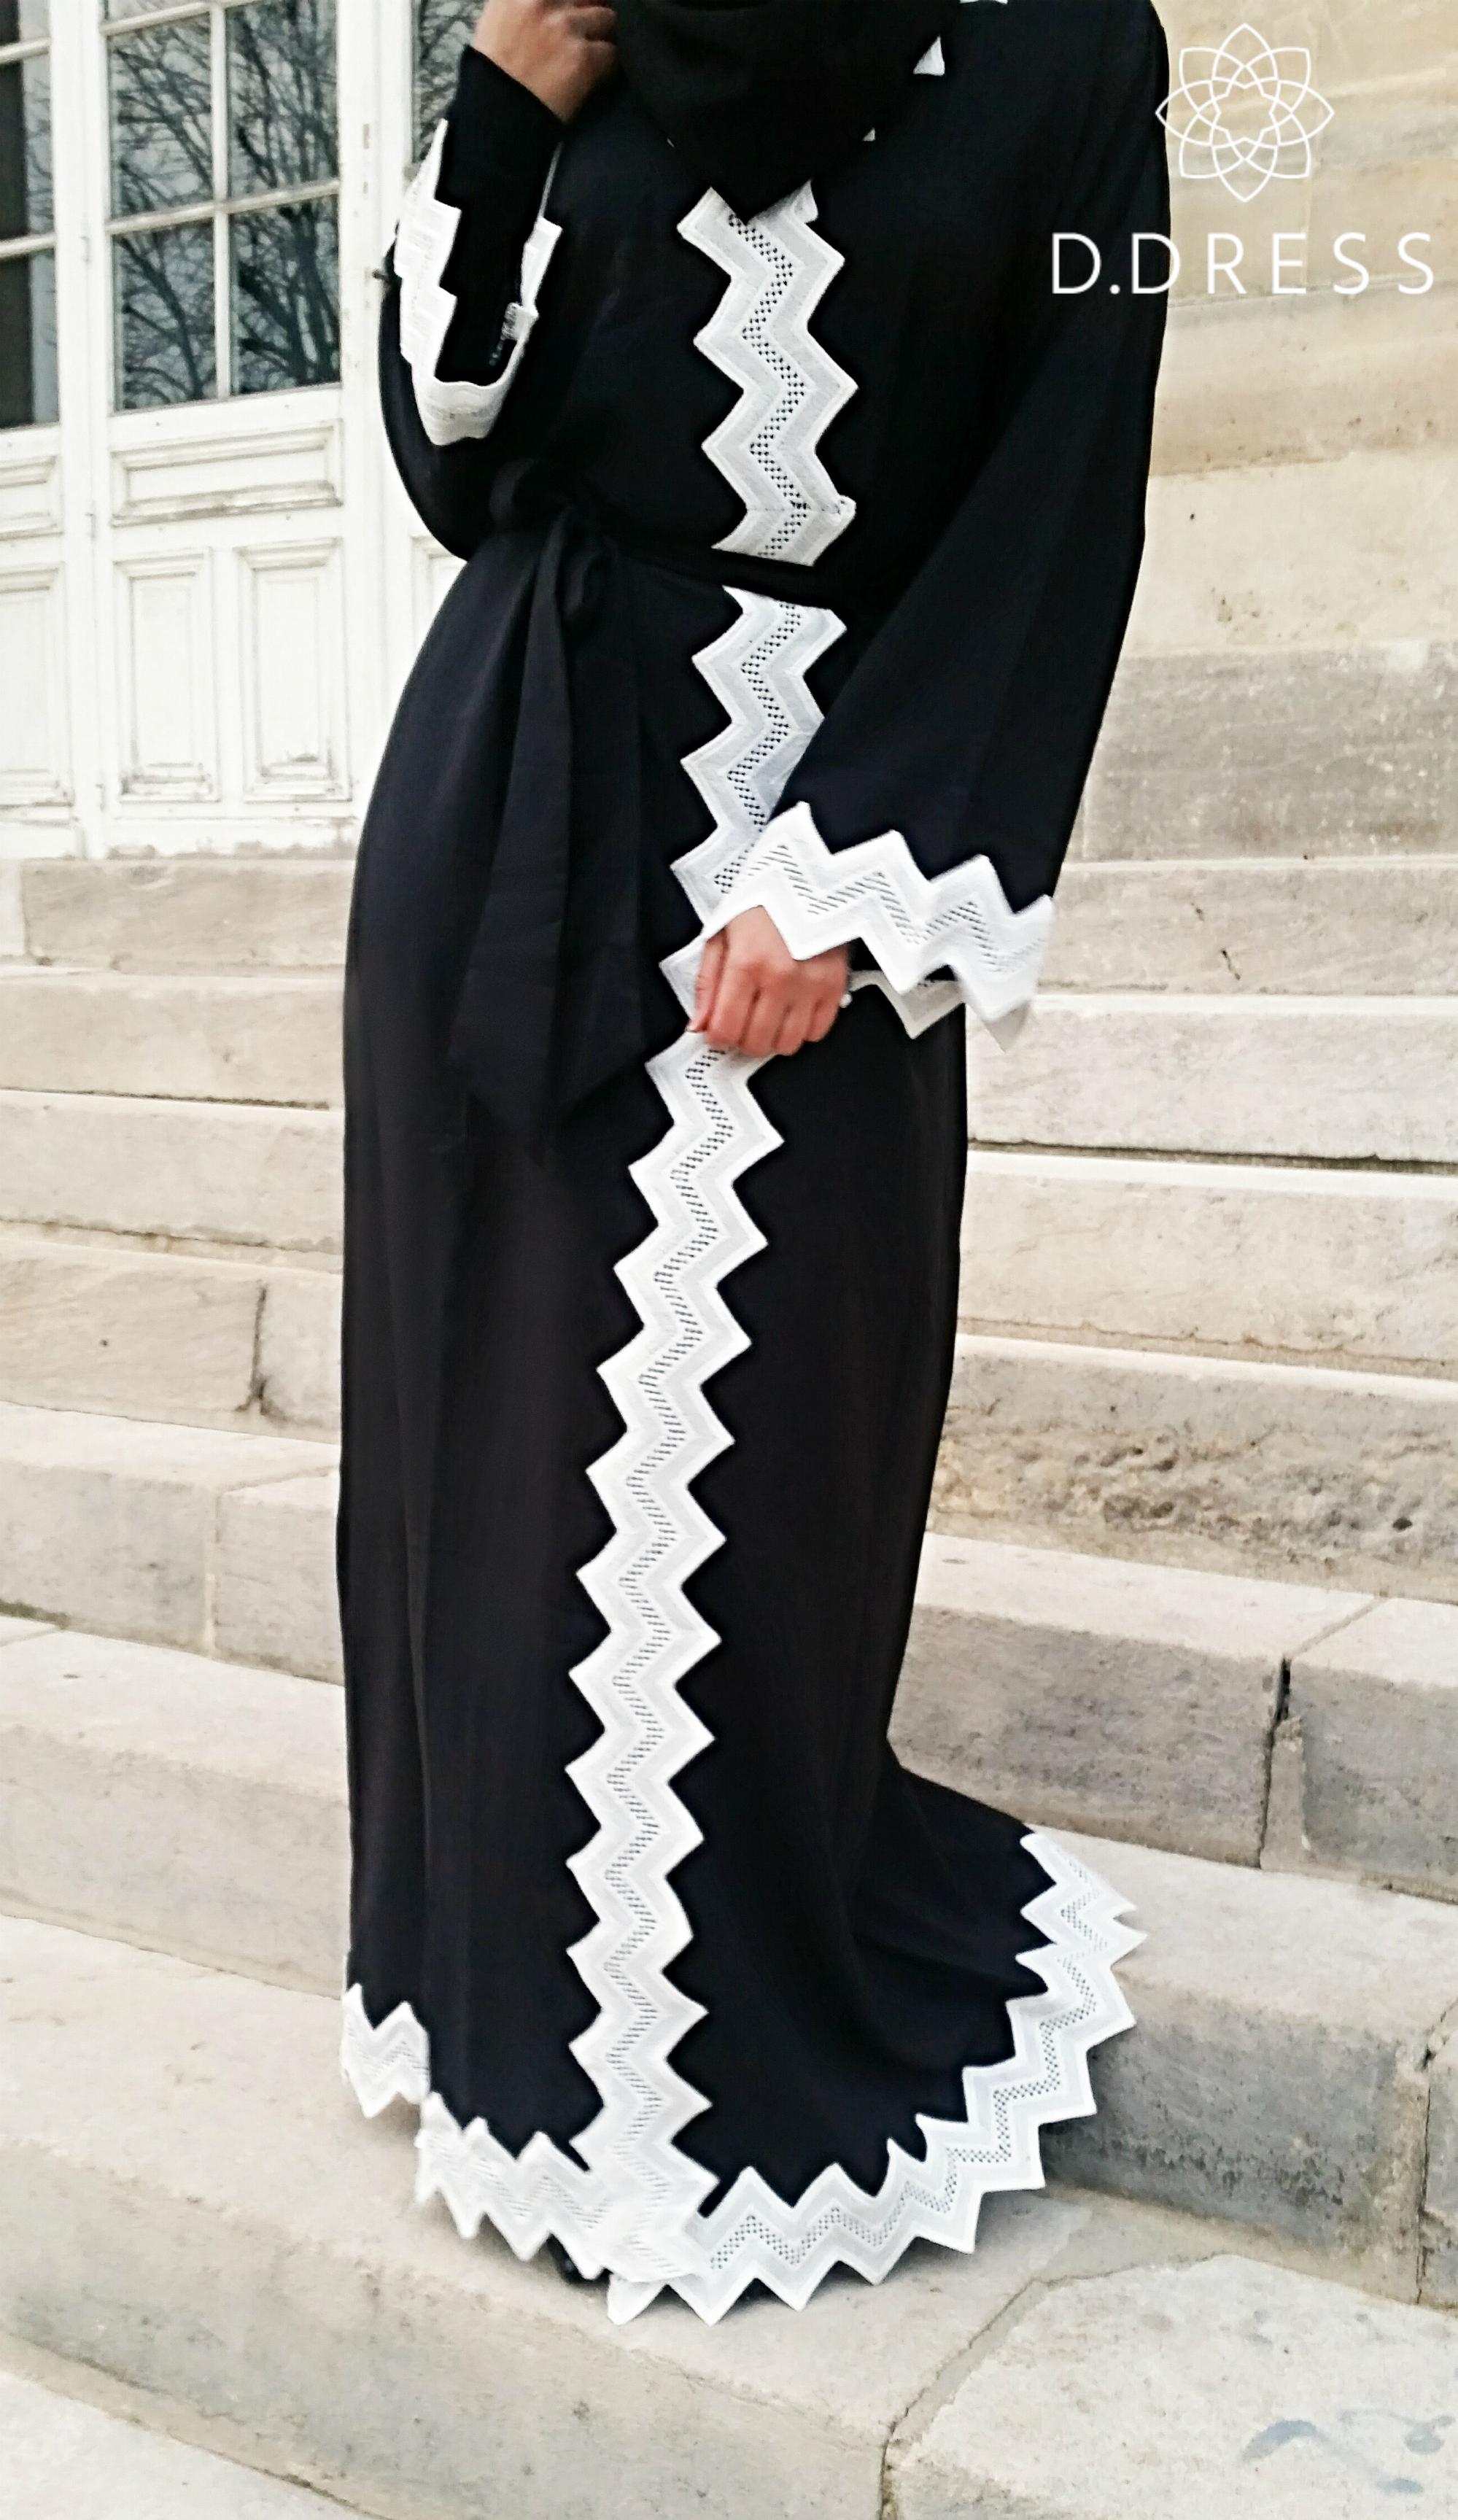 mellorine noir ddress lace nidha nidah modest abaya